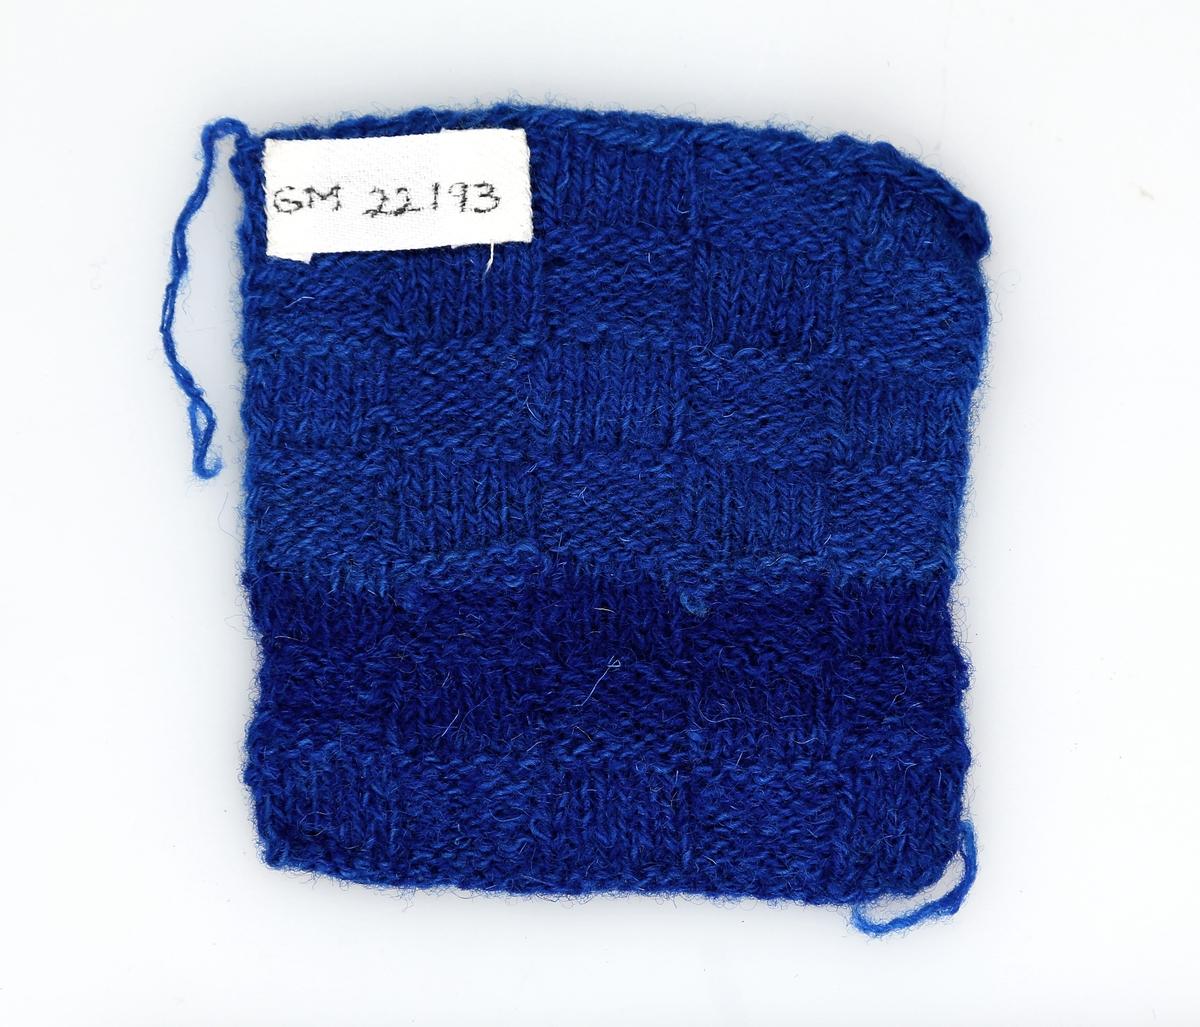 Firkantet lapp i strikket rutemønster